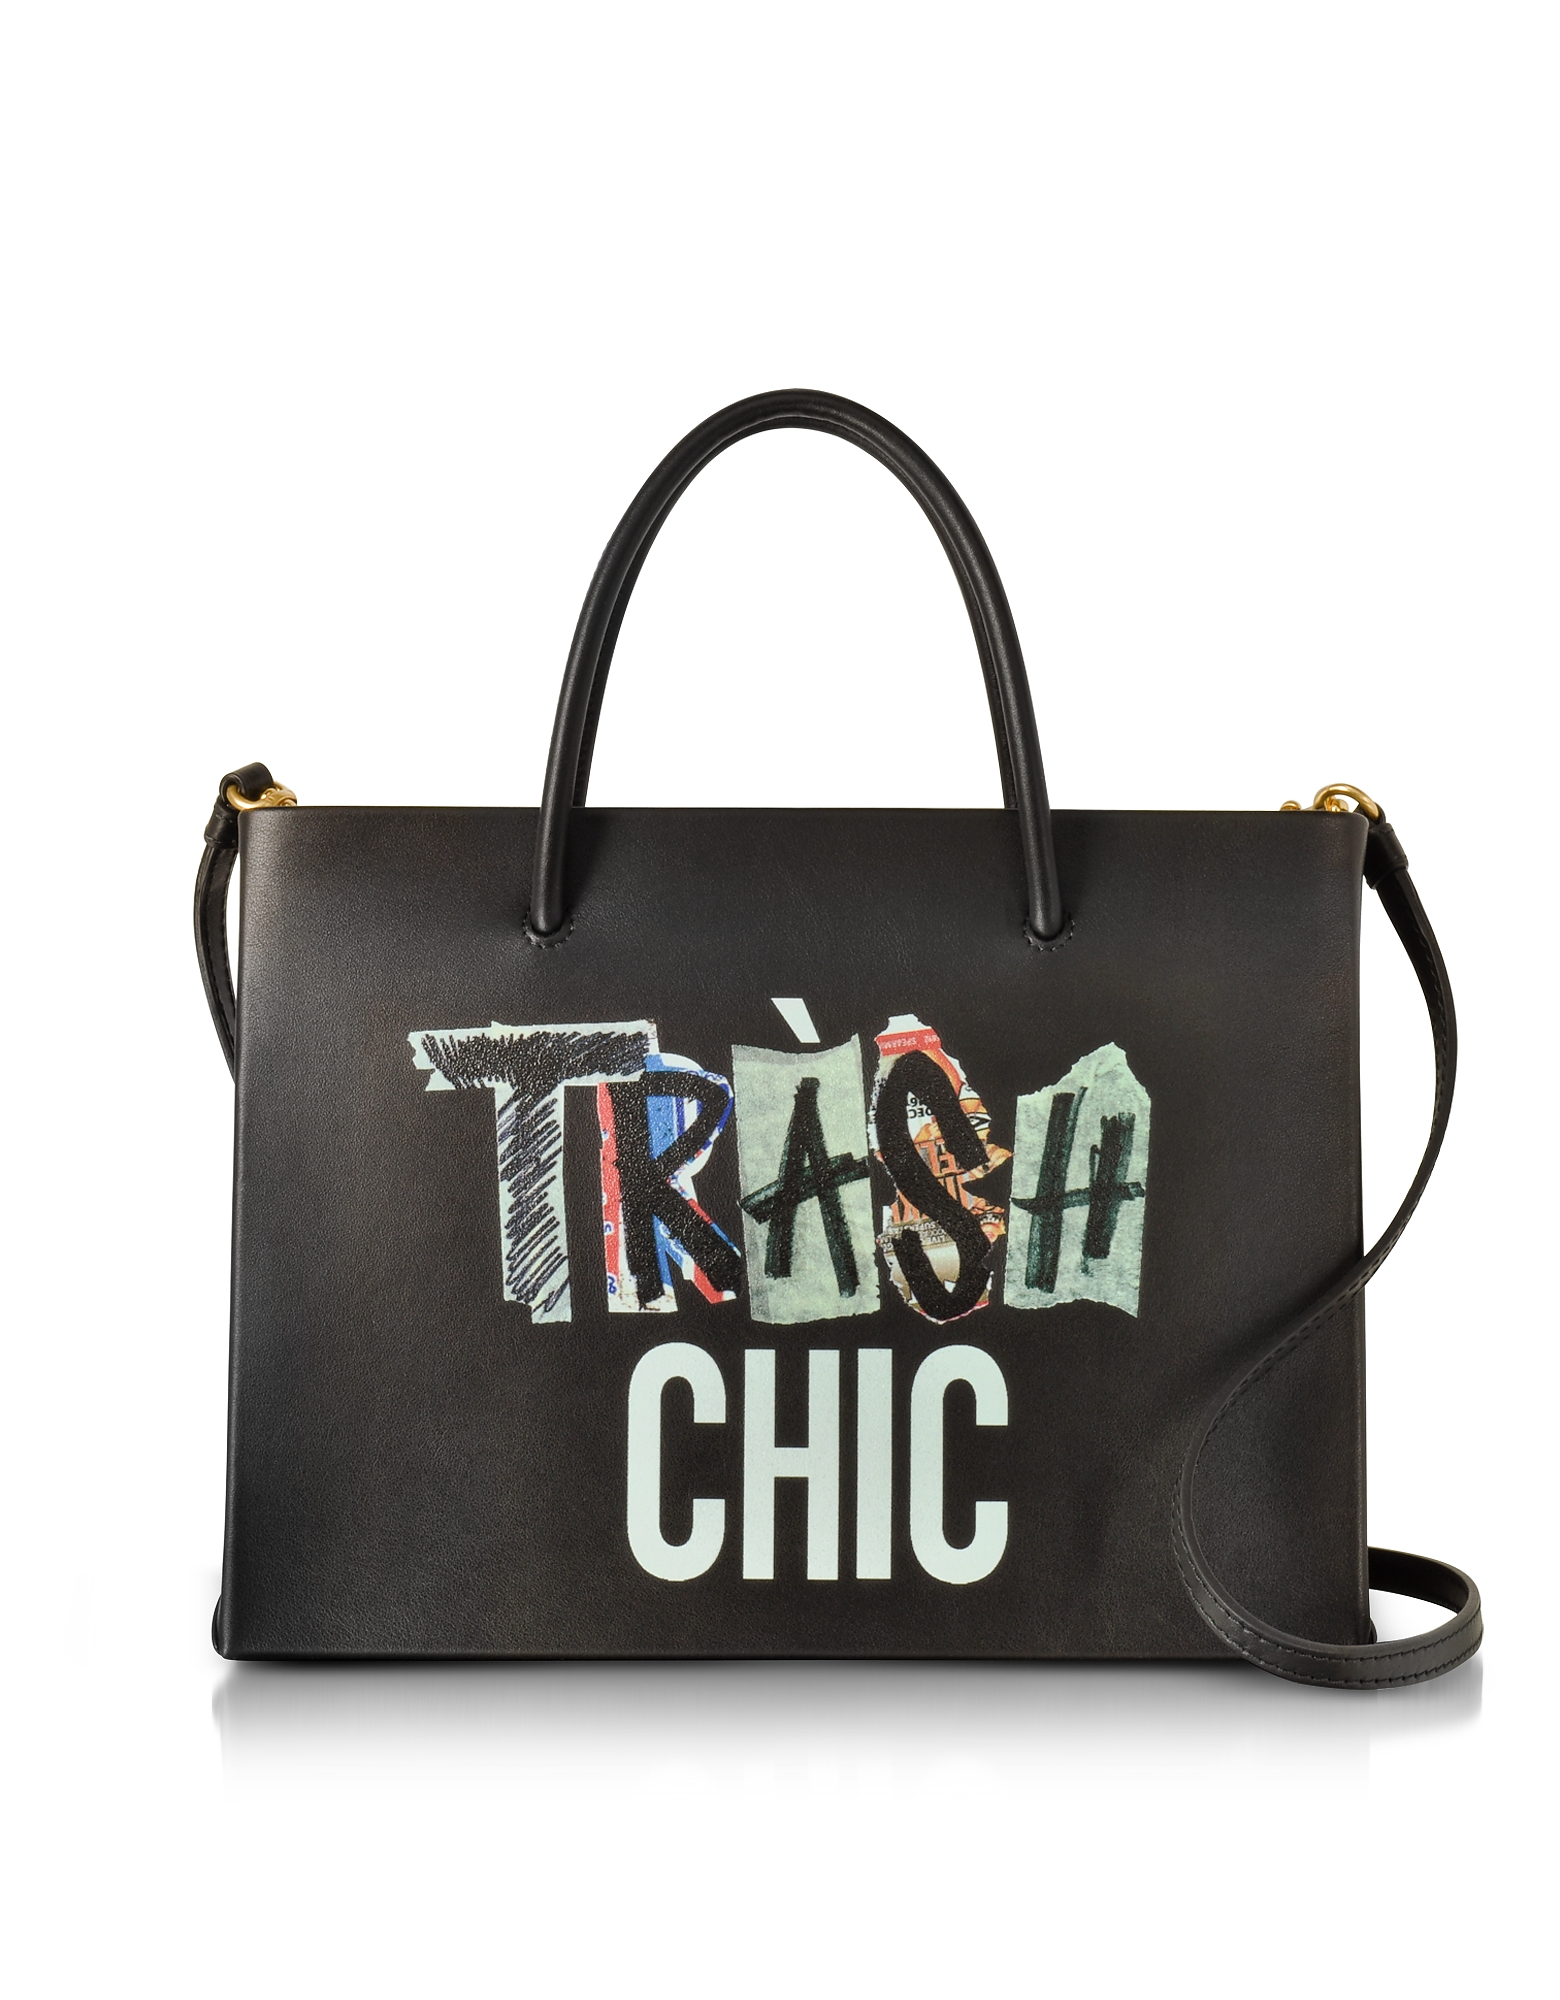 Moschino Trash Chic Black Leather Satchel Bag